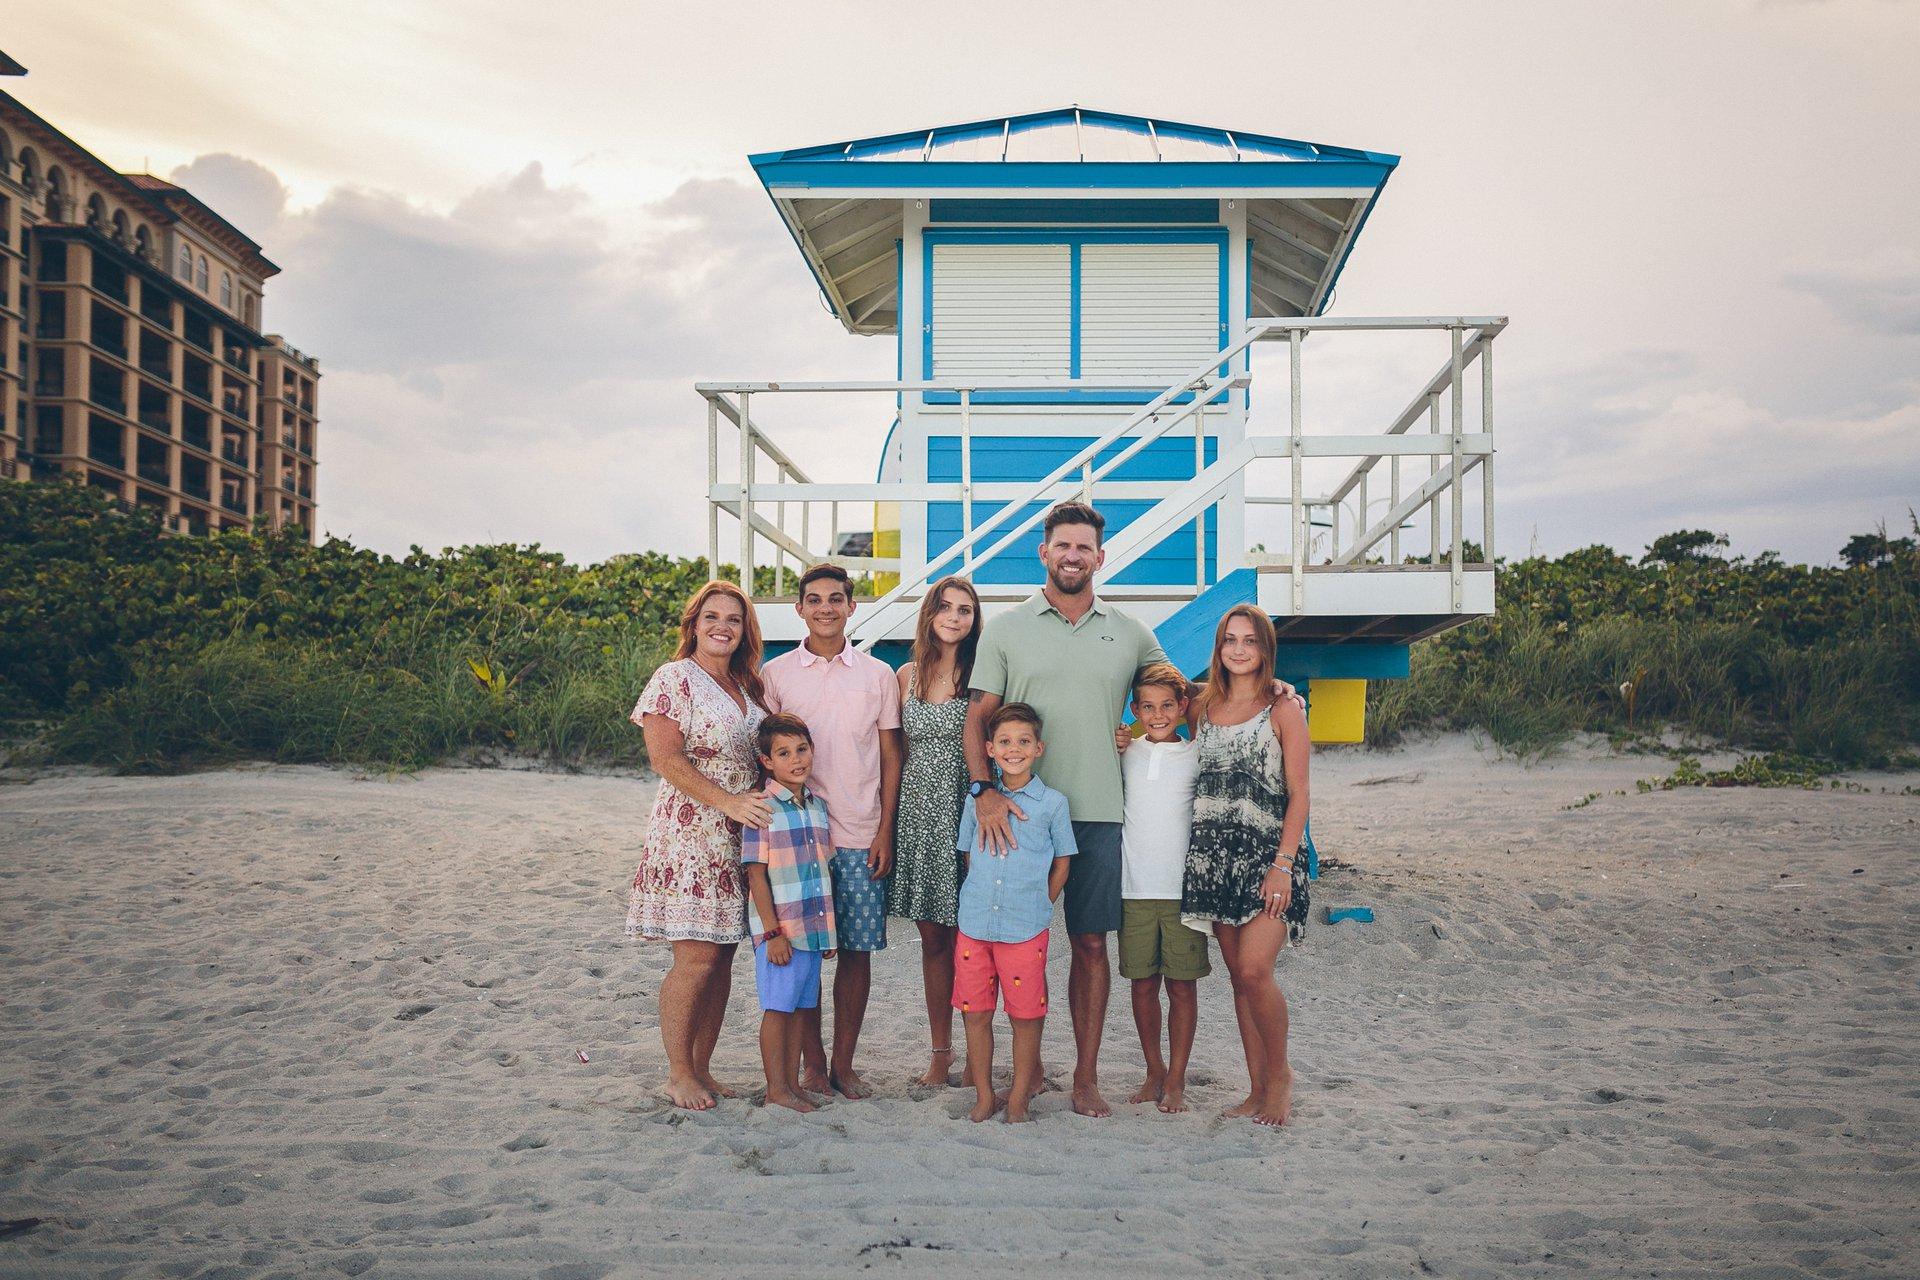 Flytographer Travel Story - Fort Lauderdale 2021